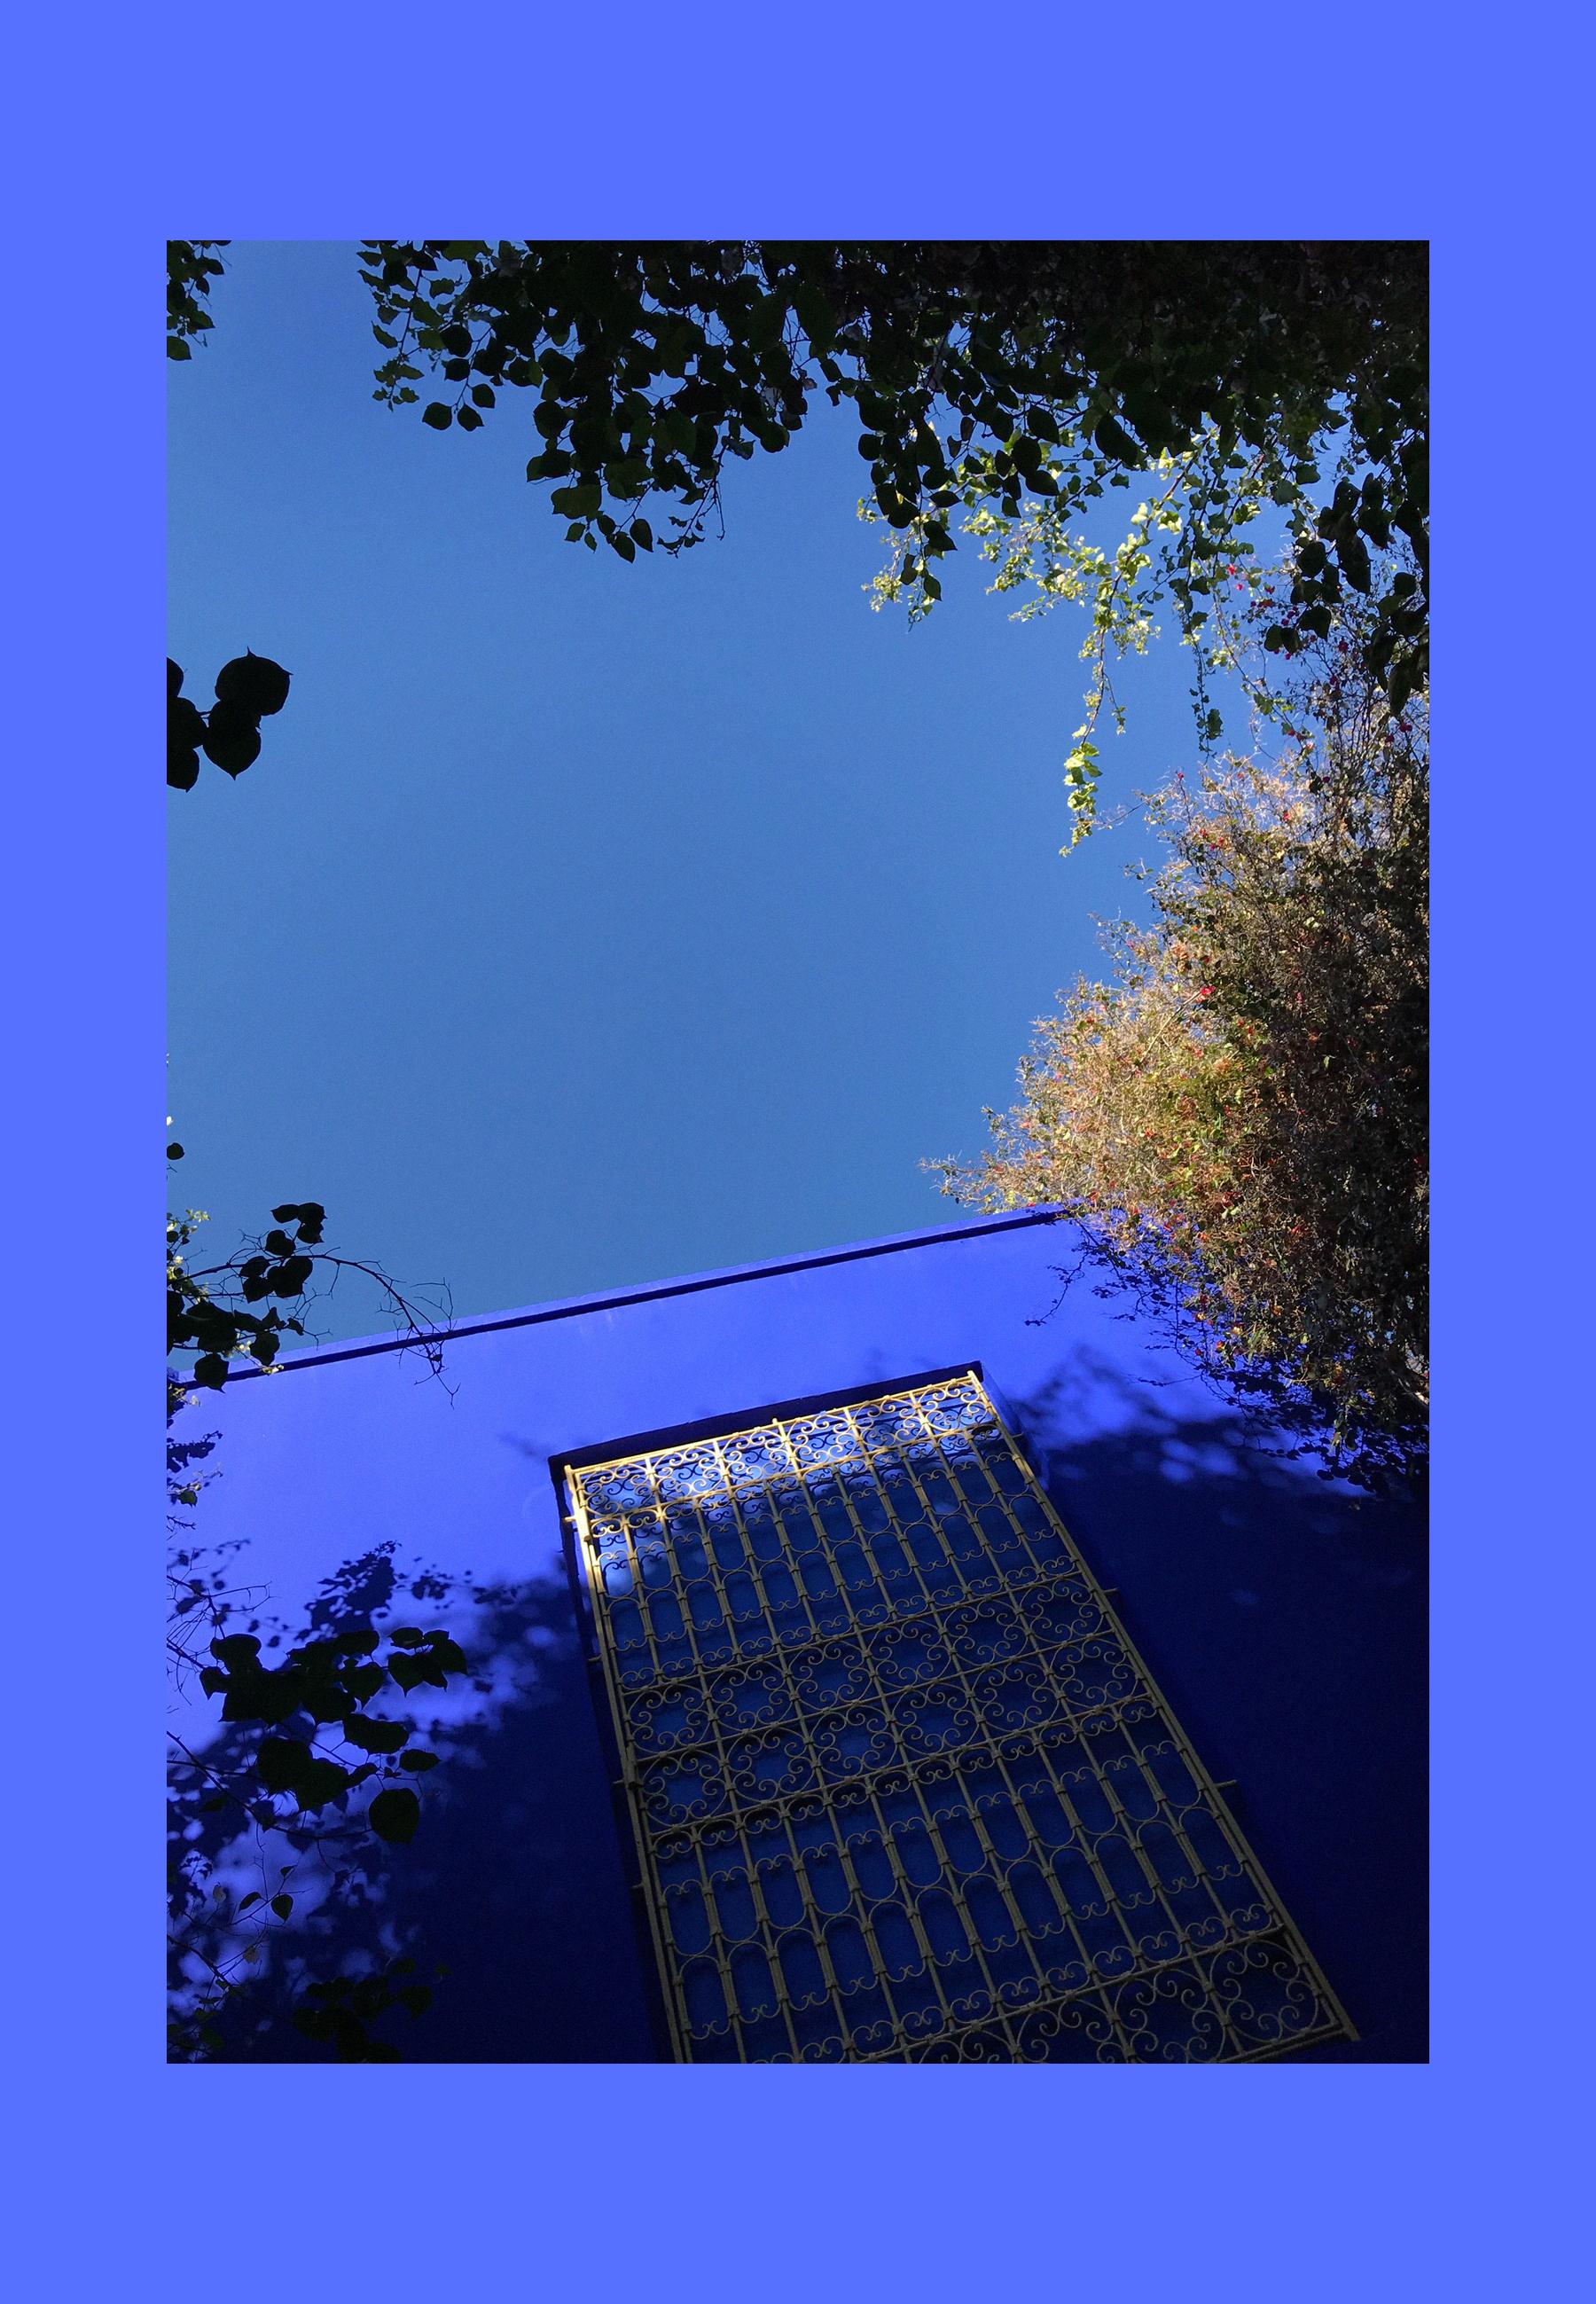 jardin majorelle yves saint laurent pierre bergé architecture musée museum morocco marrakech marrakesch travel travelblogger travelbloggers reiseblog reiseblogger reisebloggen inspiration blau bleu blue catsanddogsblog ricarda schernus max bechmann 2